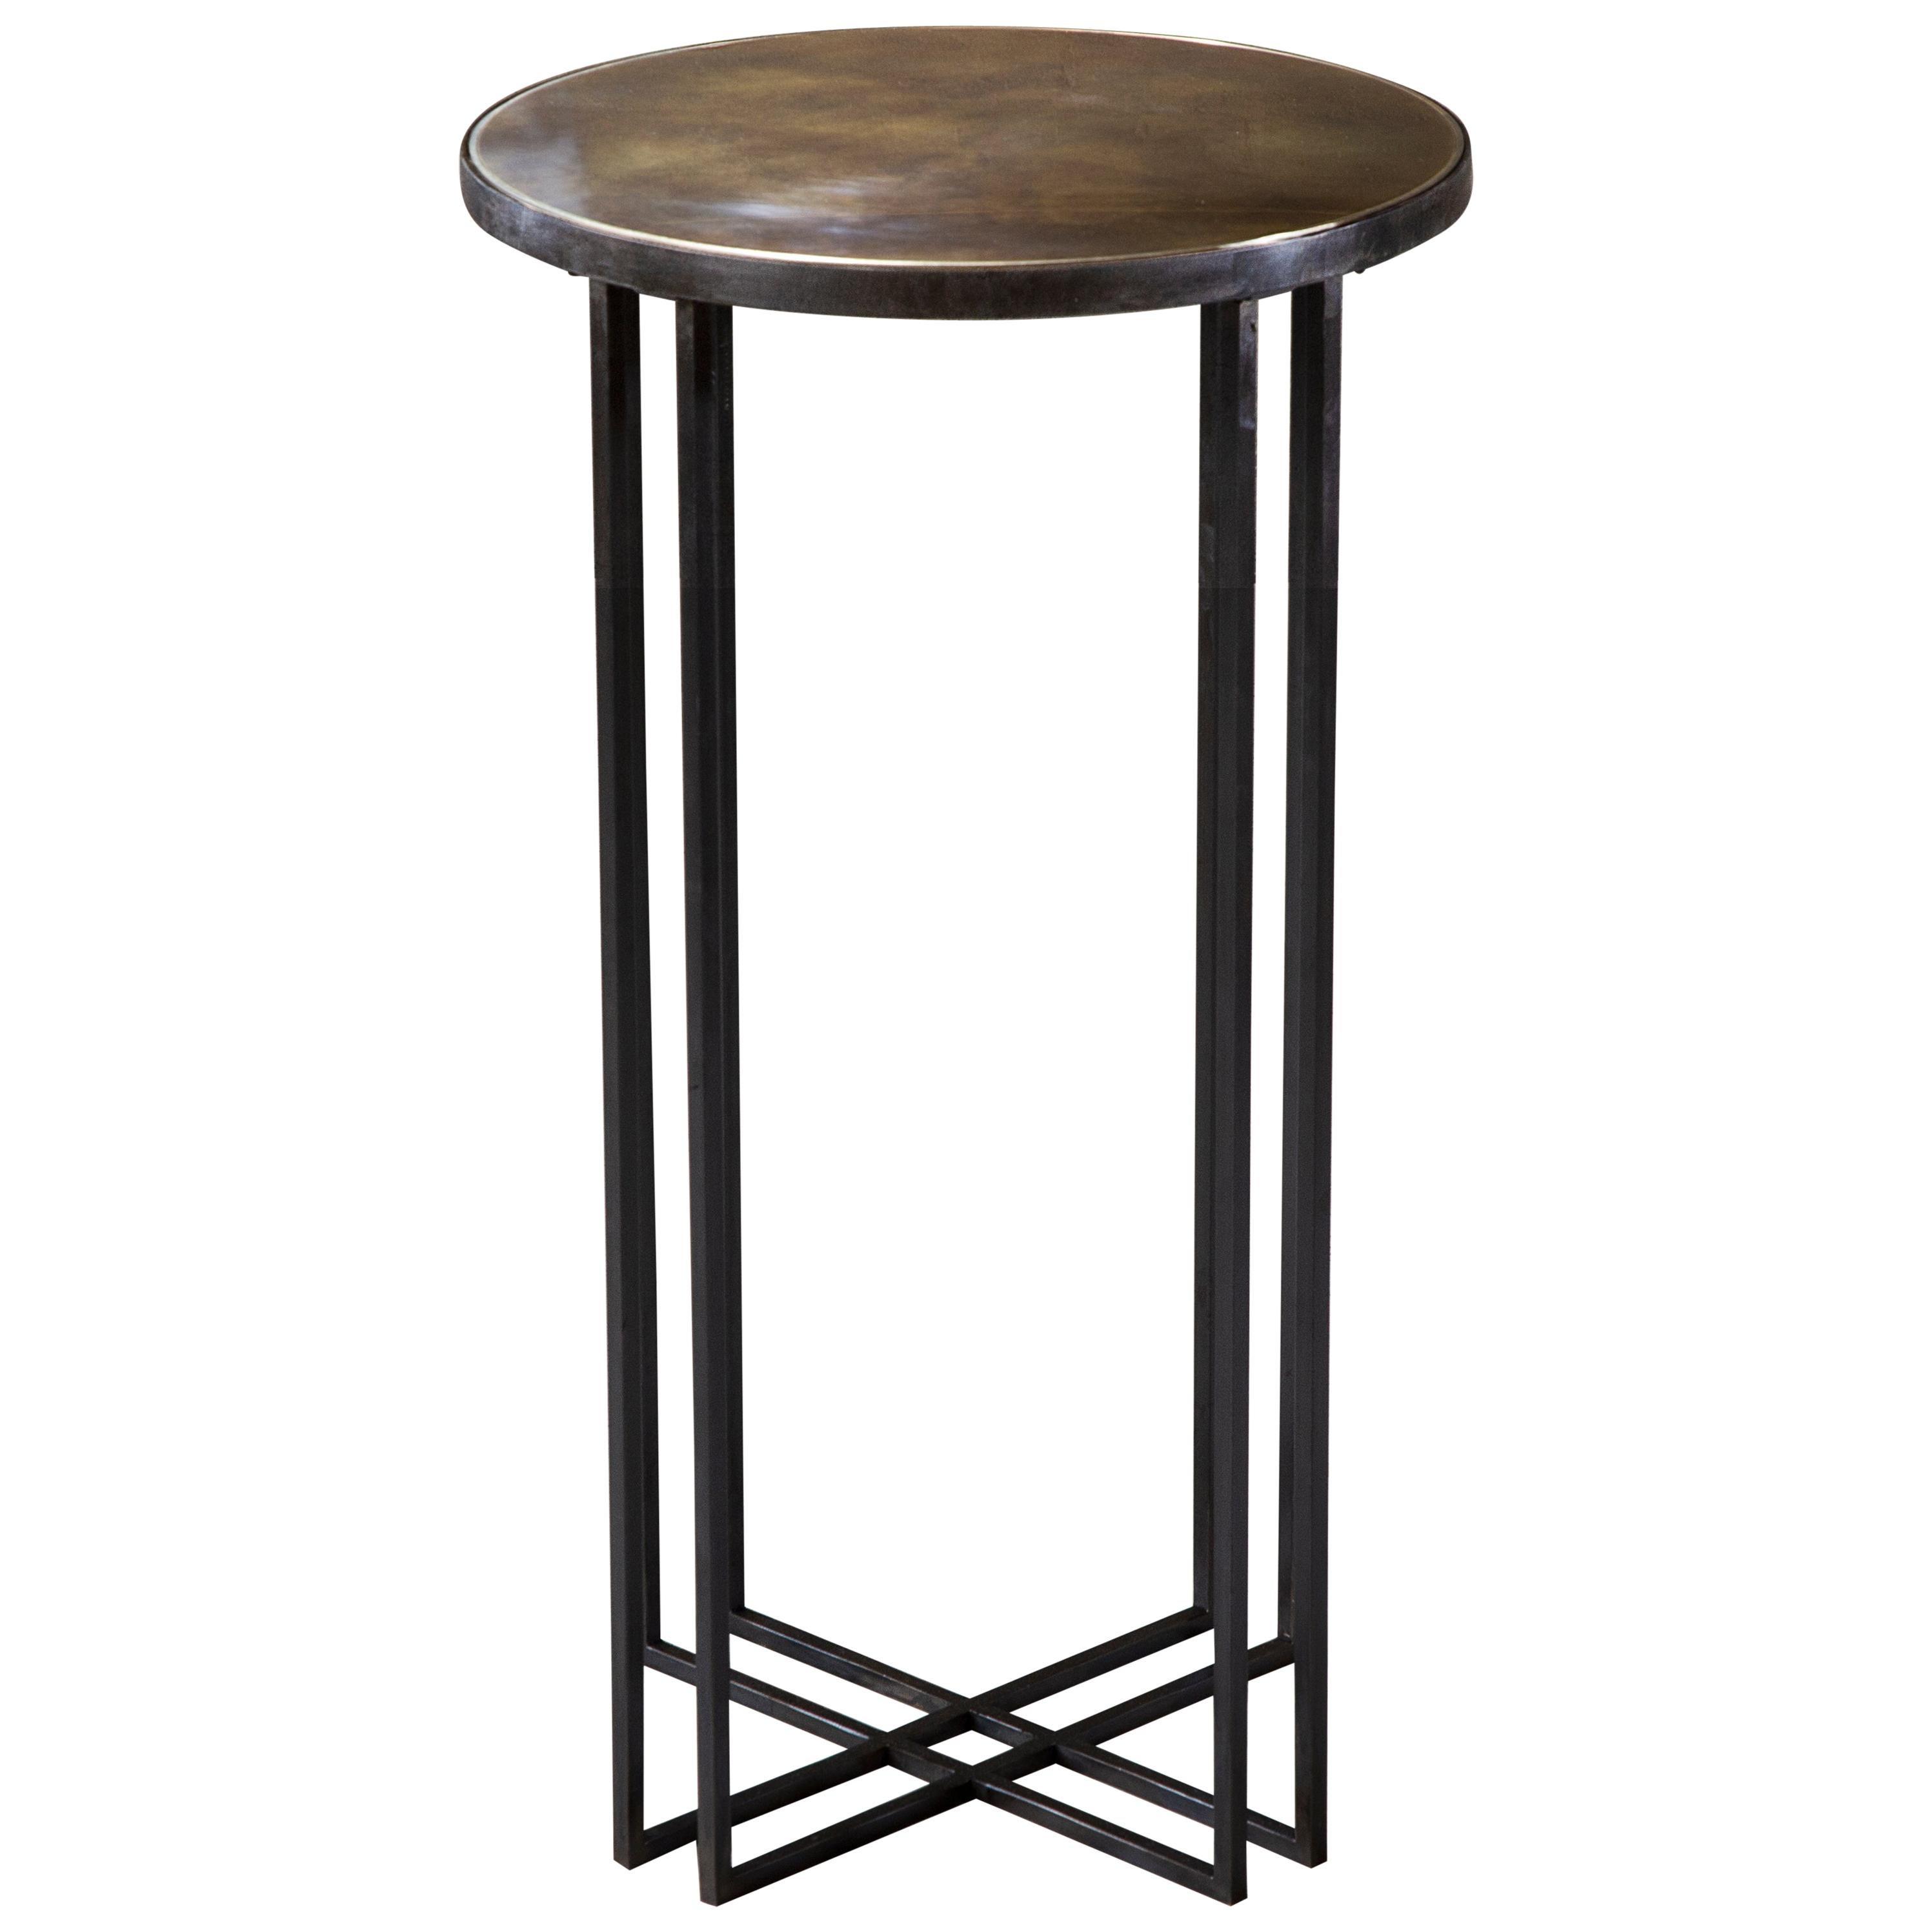 Round Binate Art Deco Minimal Metal Side Table